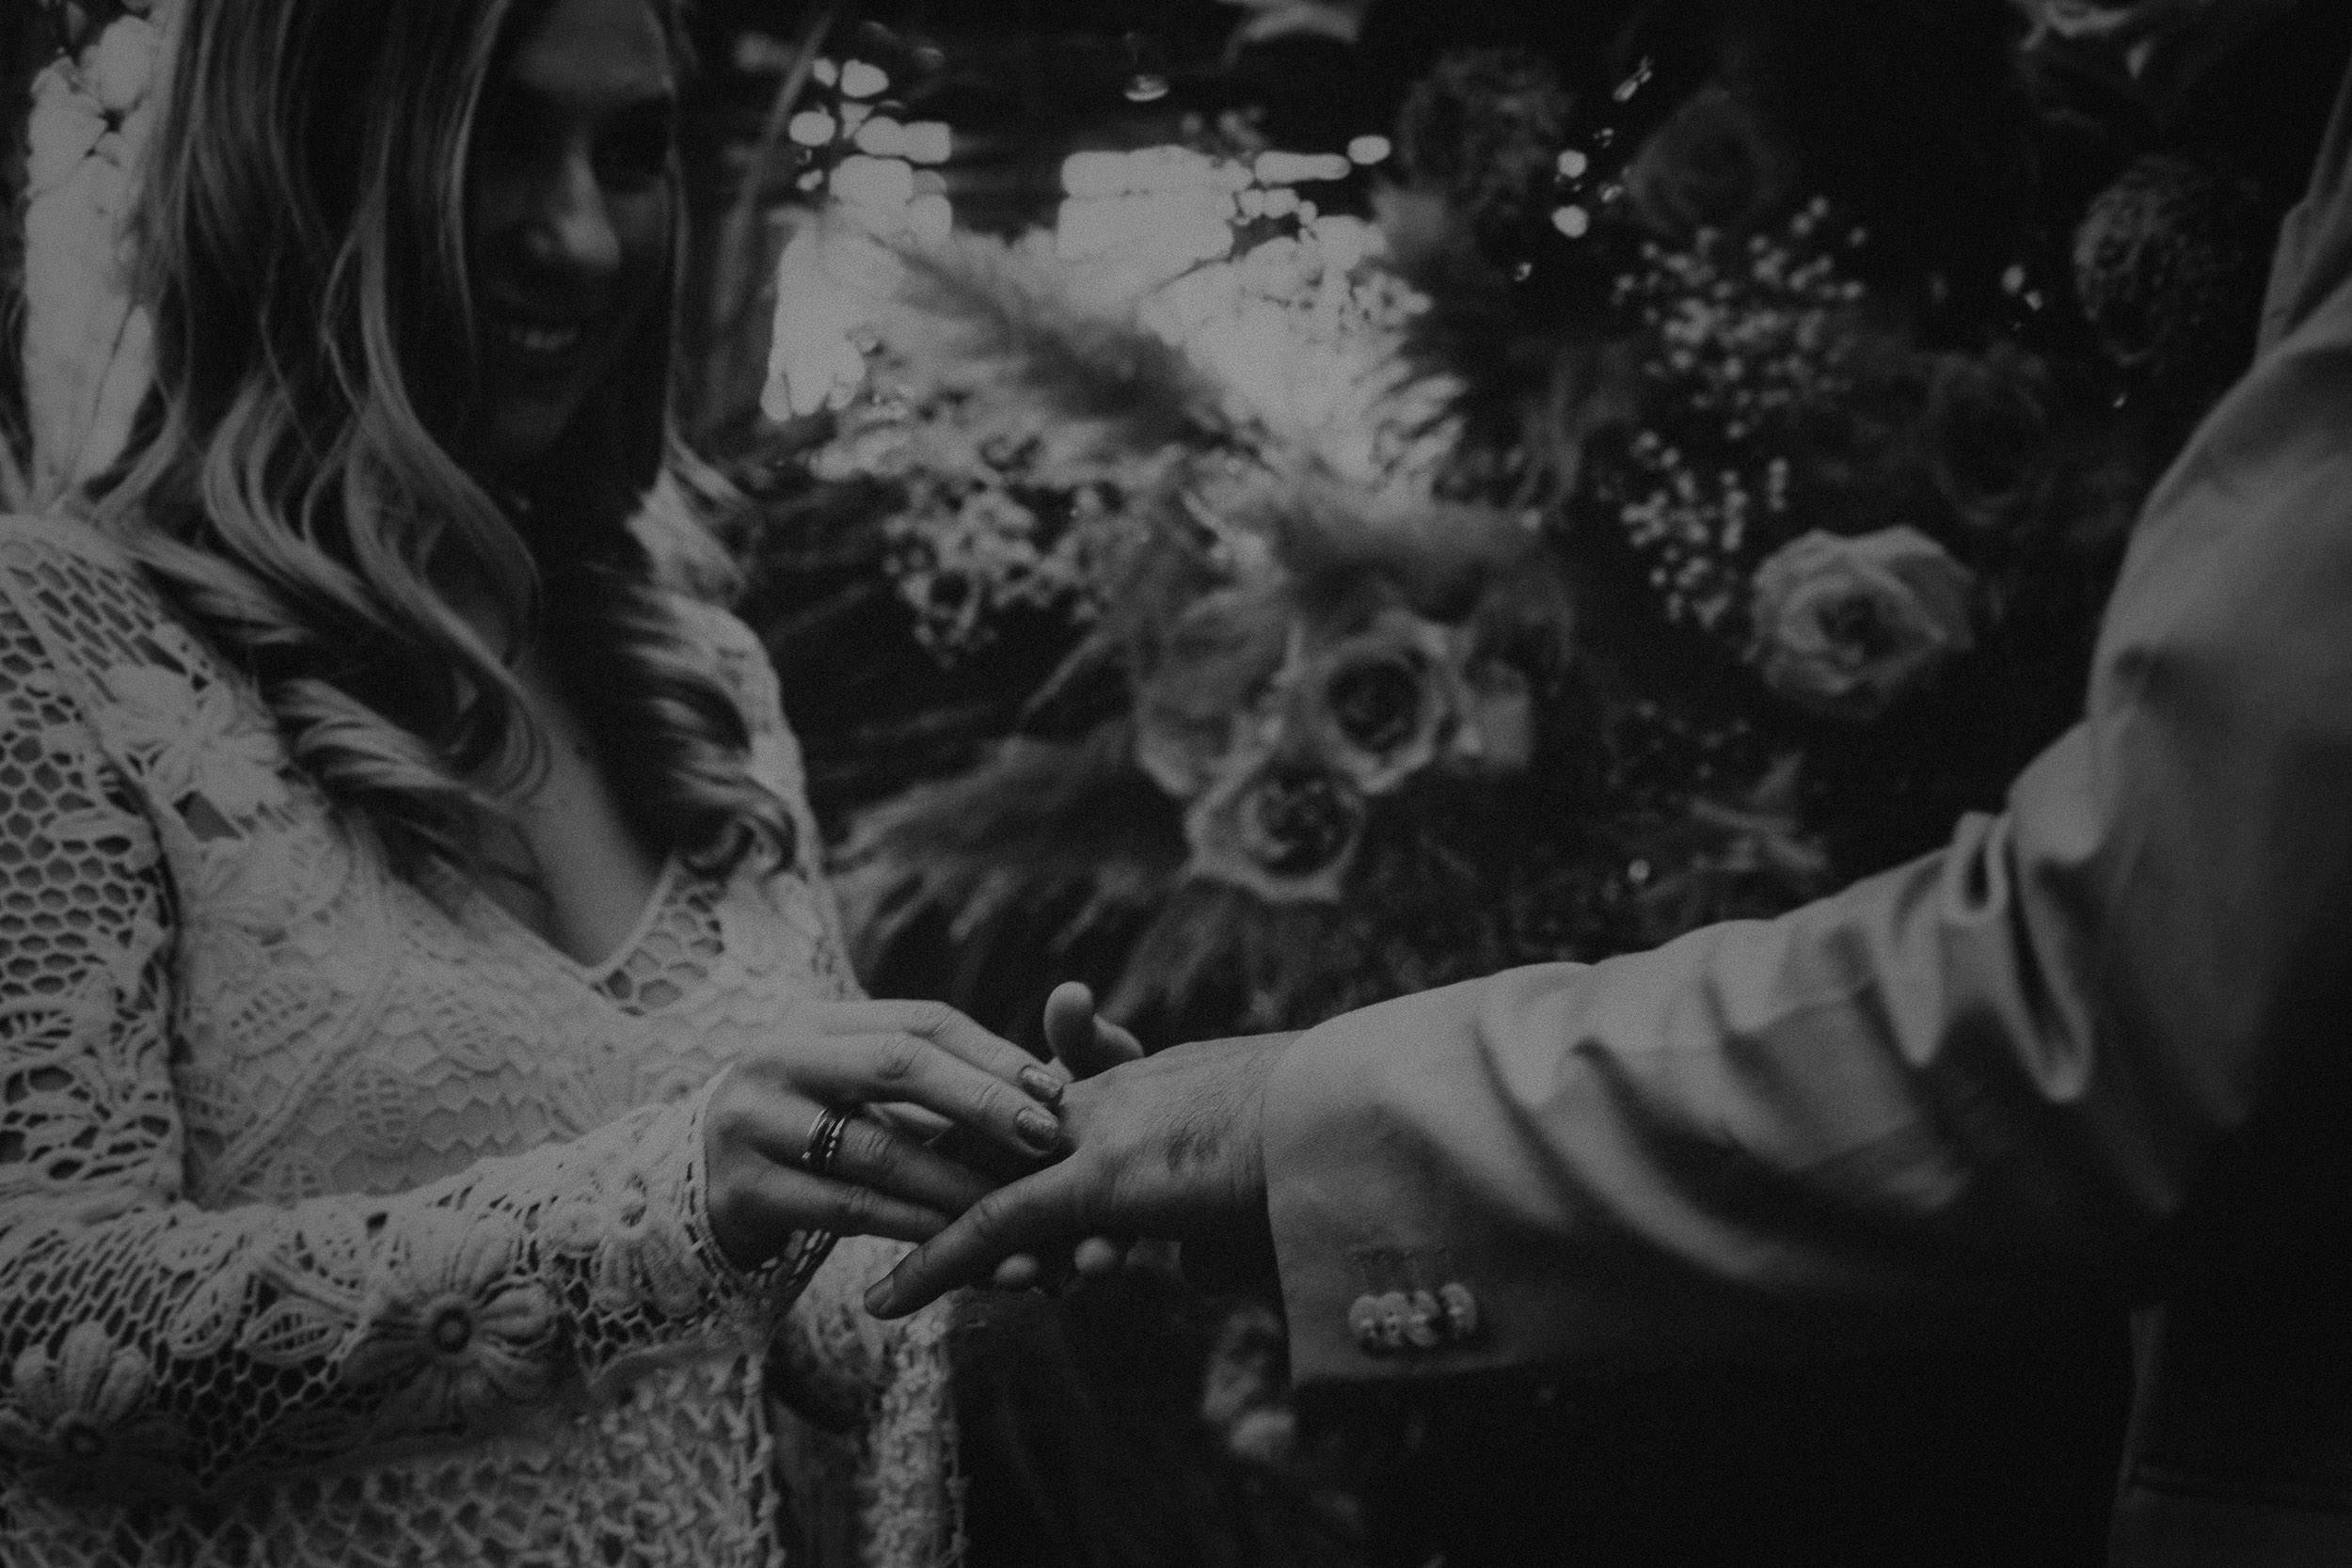 S&A Elopement - Kings & Thieves - Shred 'Til Dead - Central Coast Beach Forest Wedding - 226.jpg